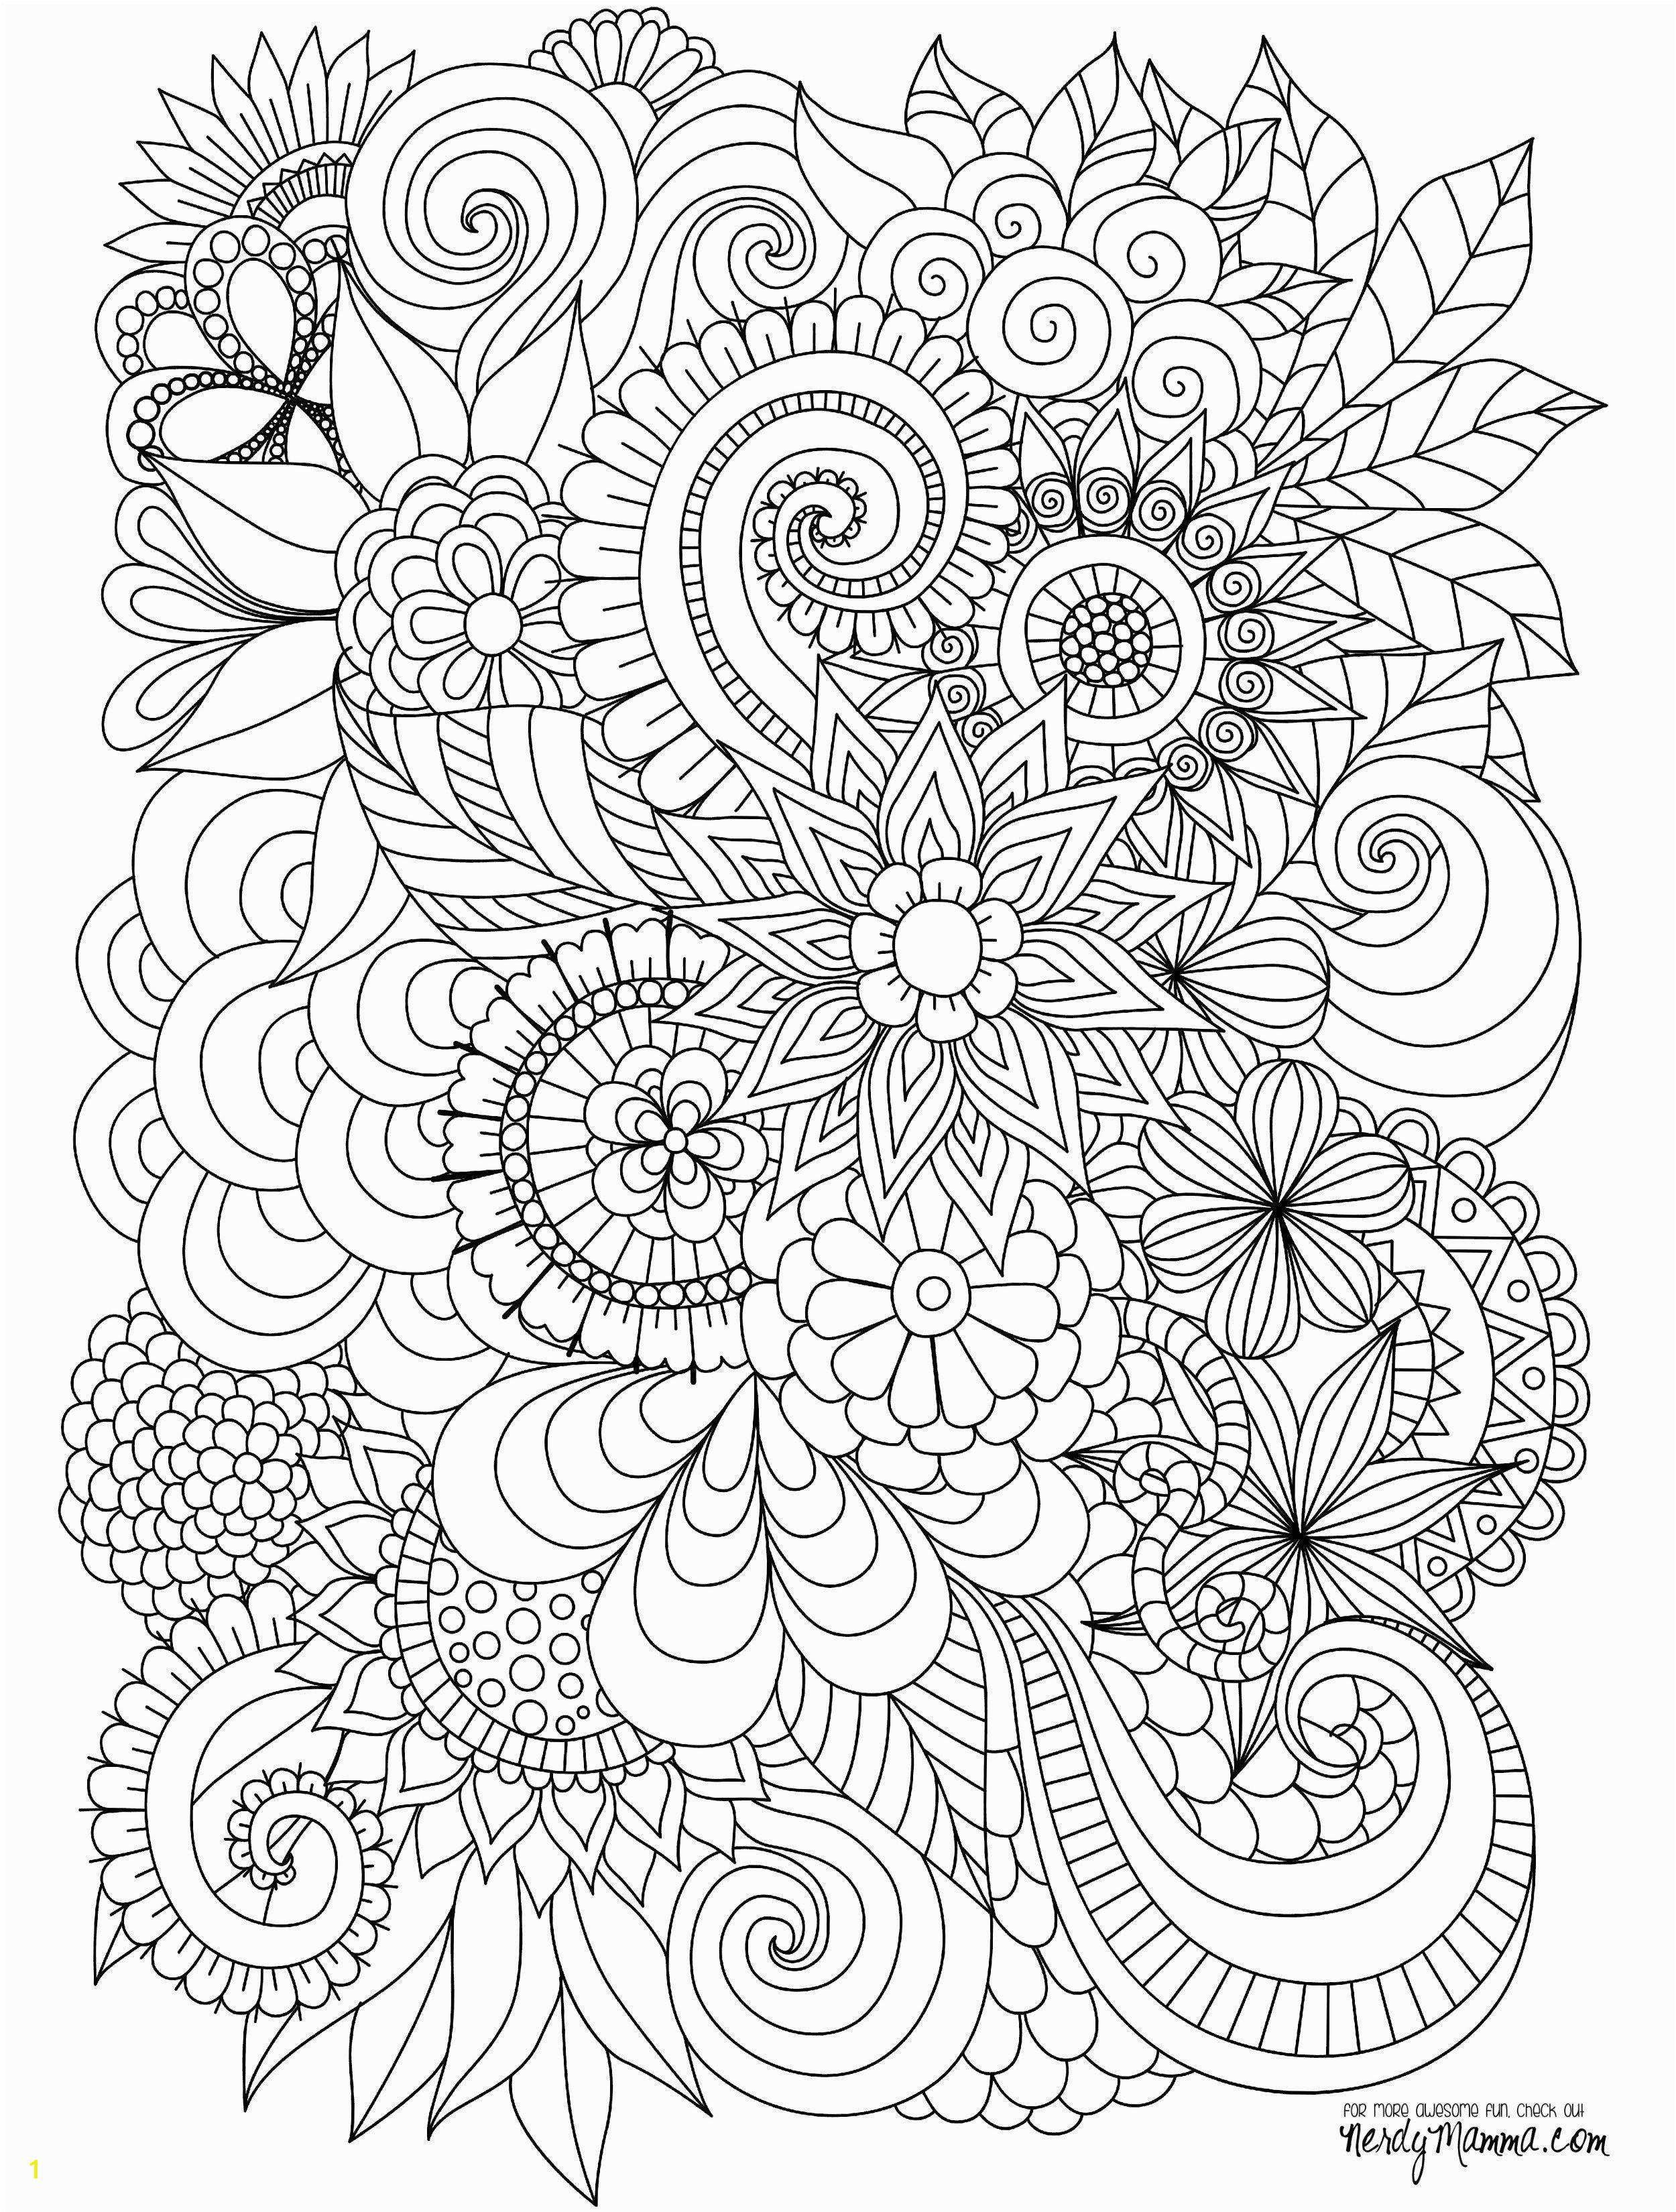 Flowers Abstract Coloring pages colouring adult detailed advanced printable Kleuren voor volwassenen coloriage pour adulte anti stress kleurplaat voor